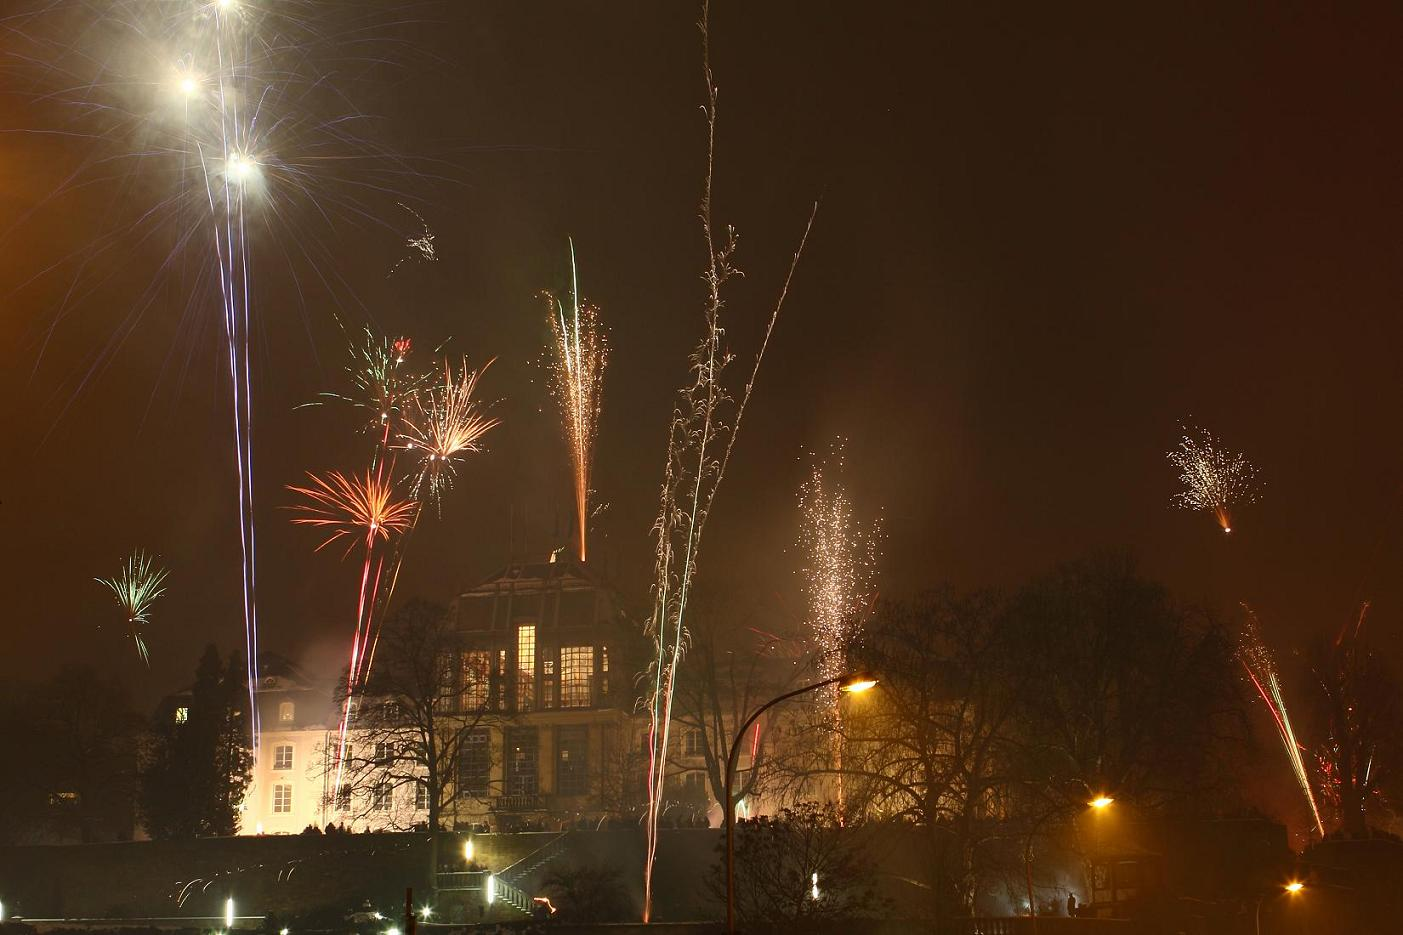 Feuerwerk Saarbrücken 31.12.2010